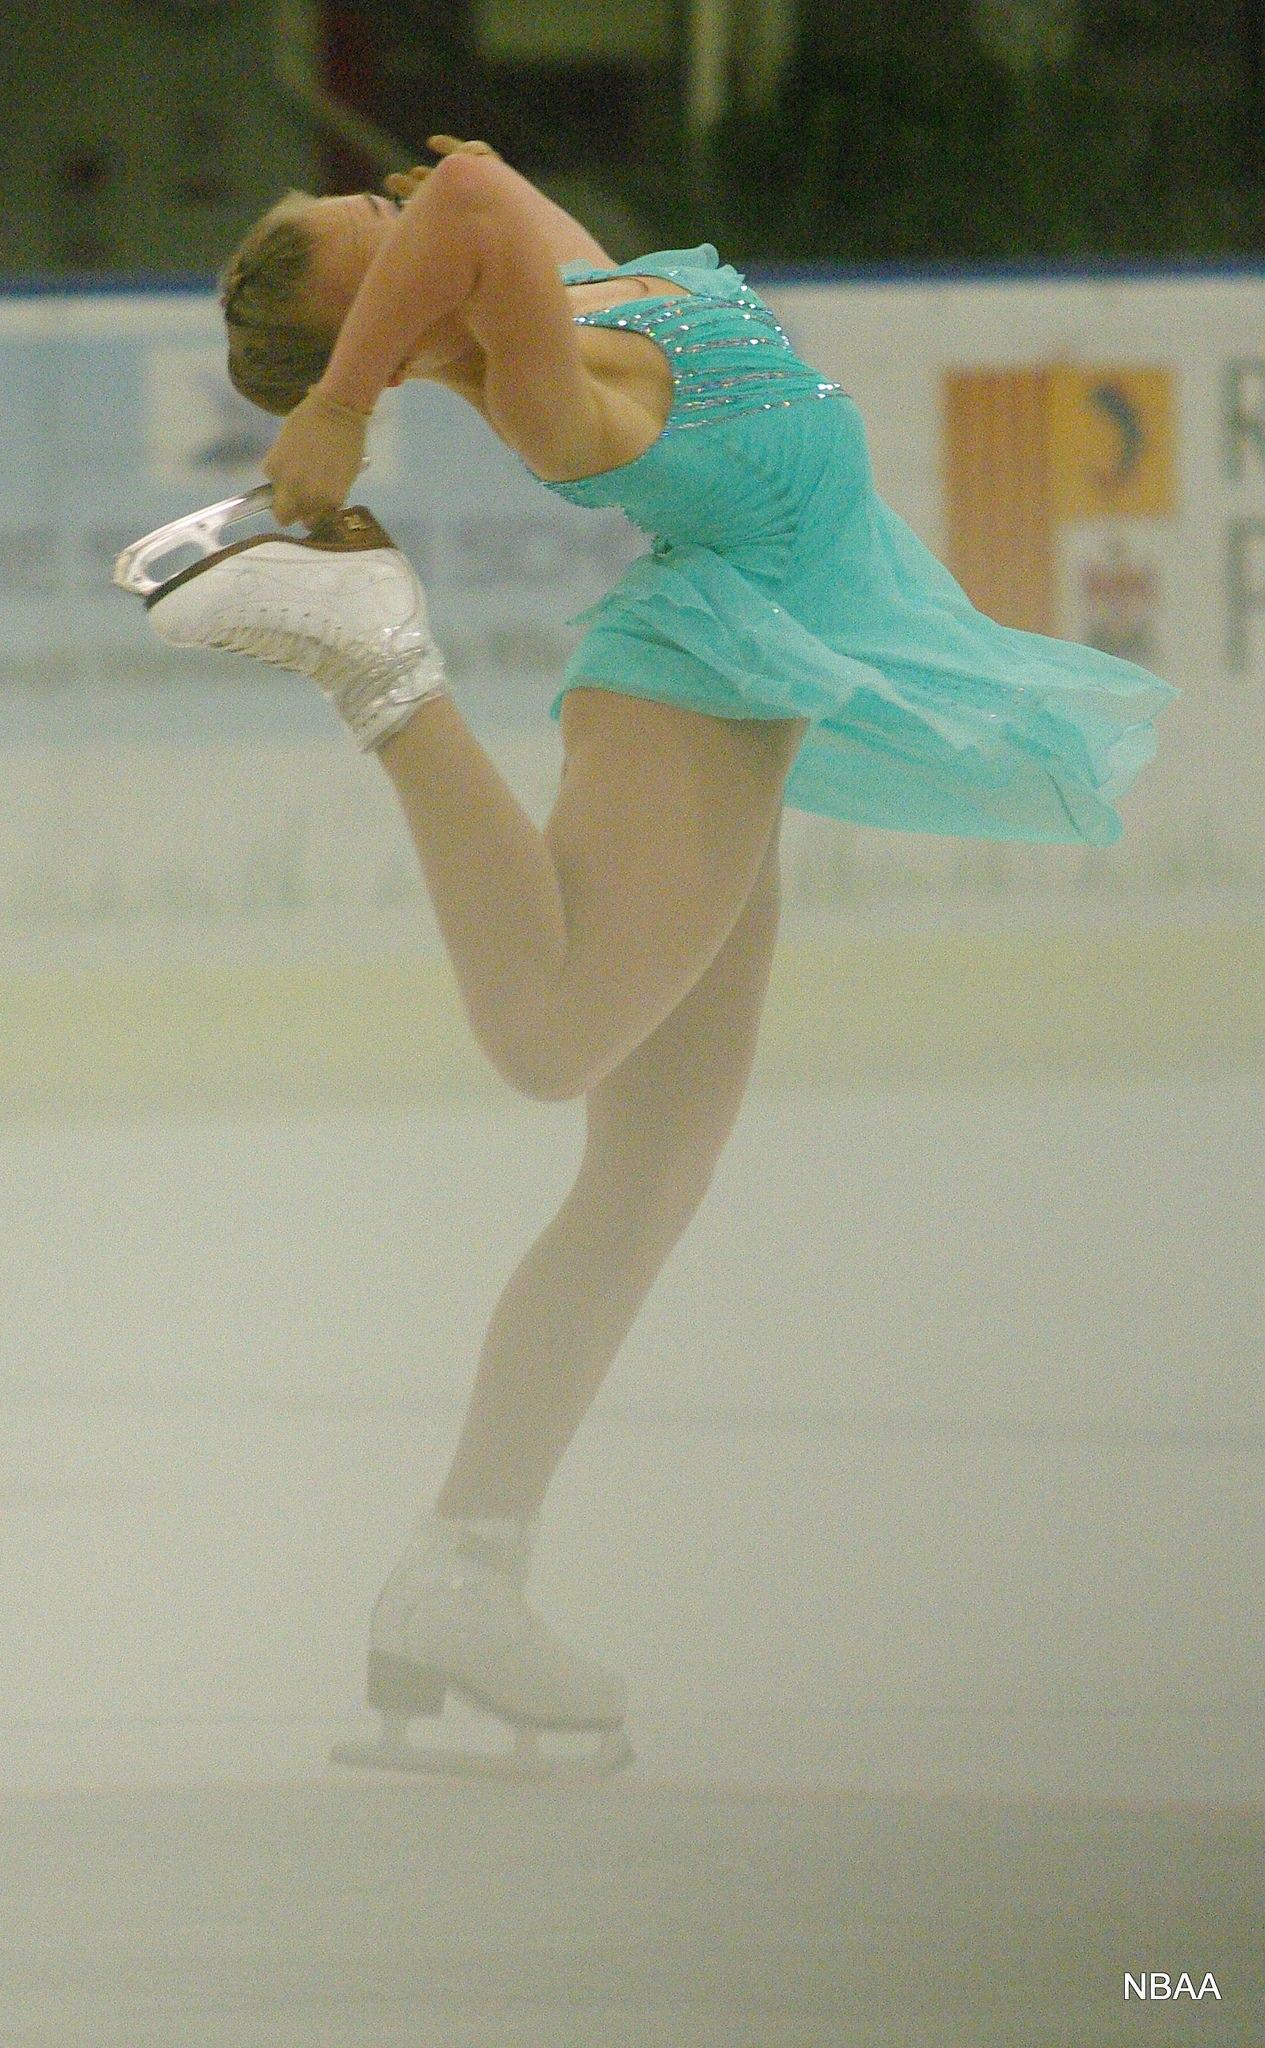 Анастасия Губанова - Страница 10 EHjSgwLiNsY